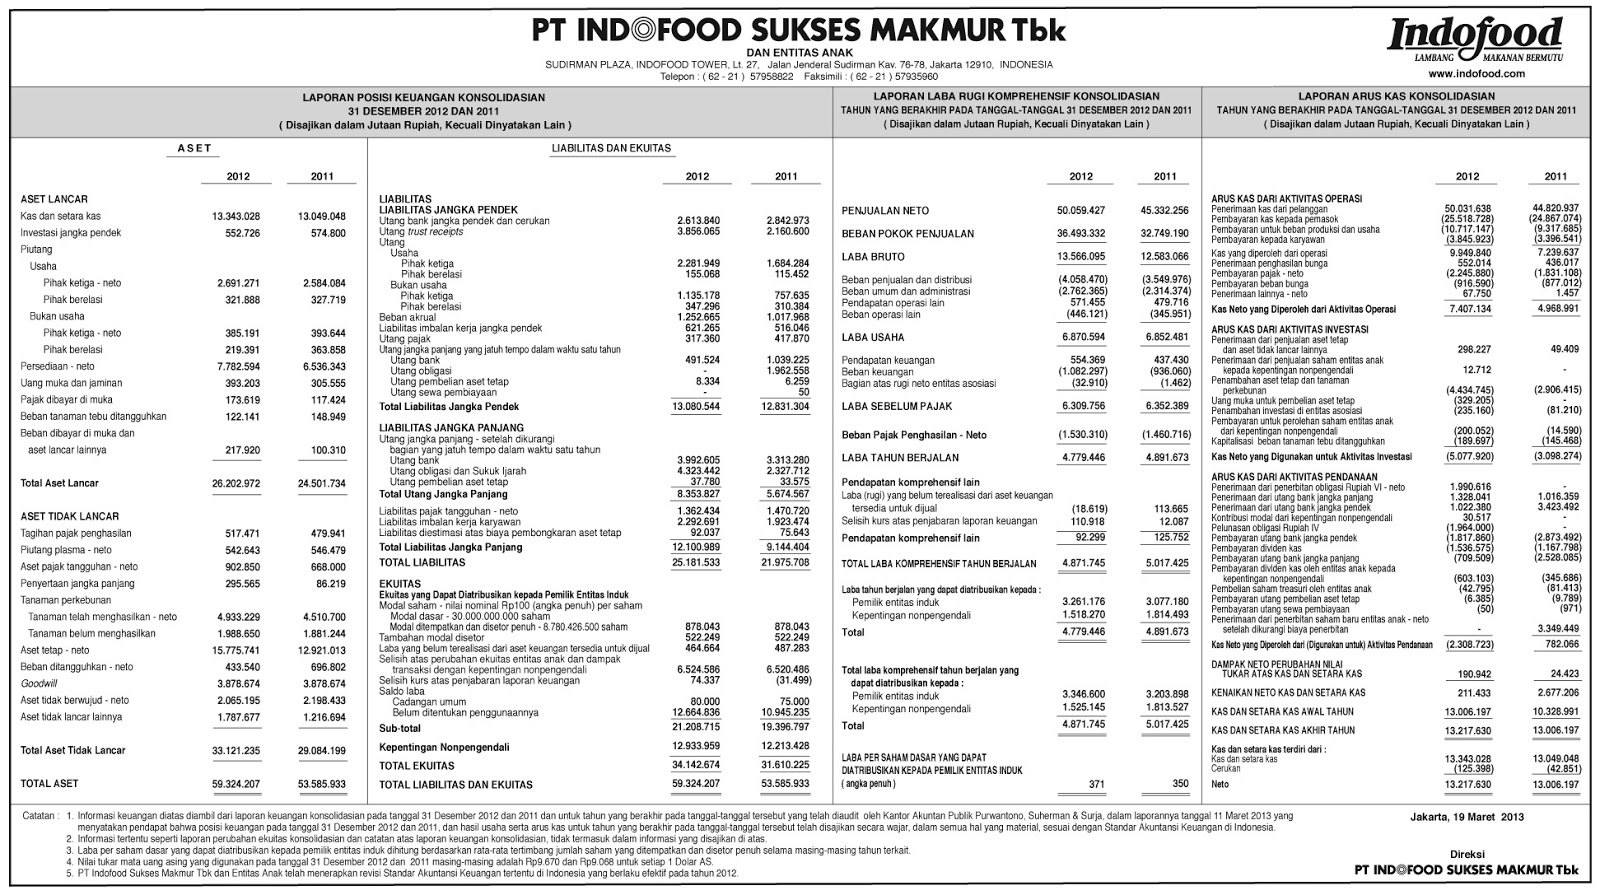 Laporan Neraca Dan Laba Rugi Perusahaan Indofood